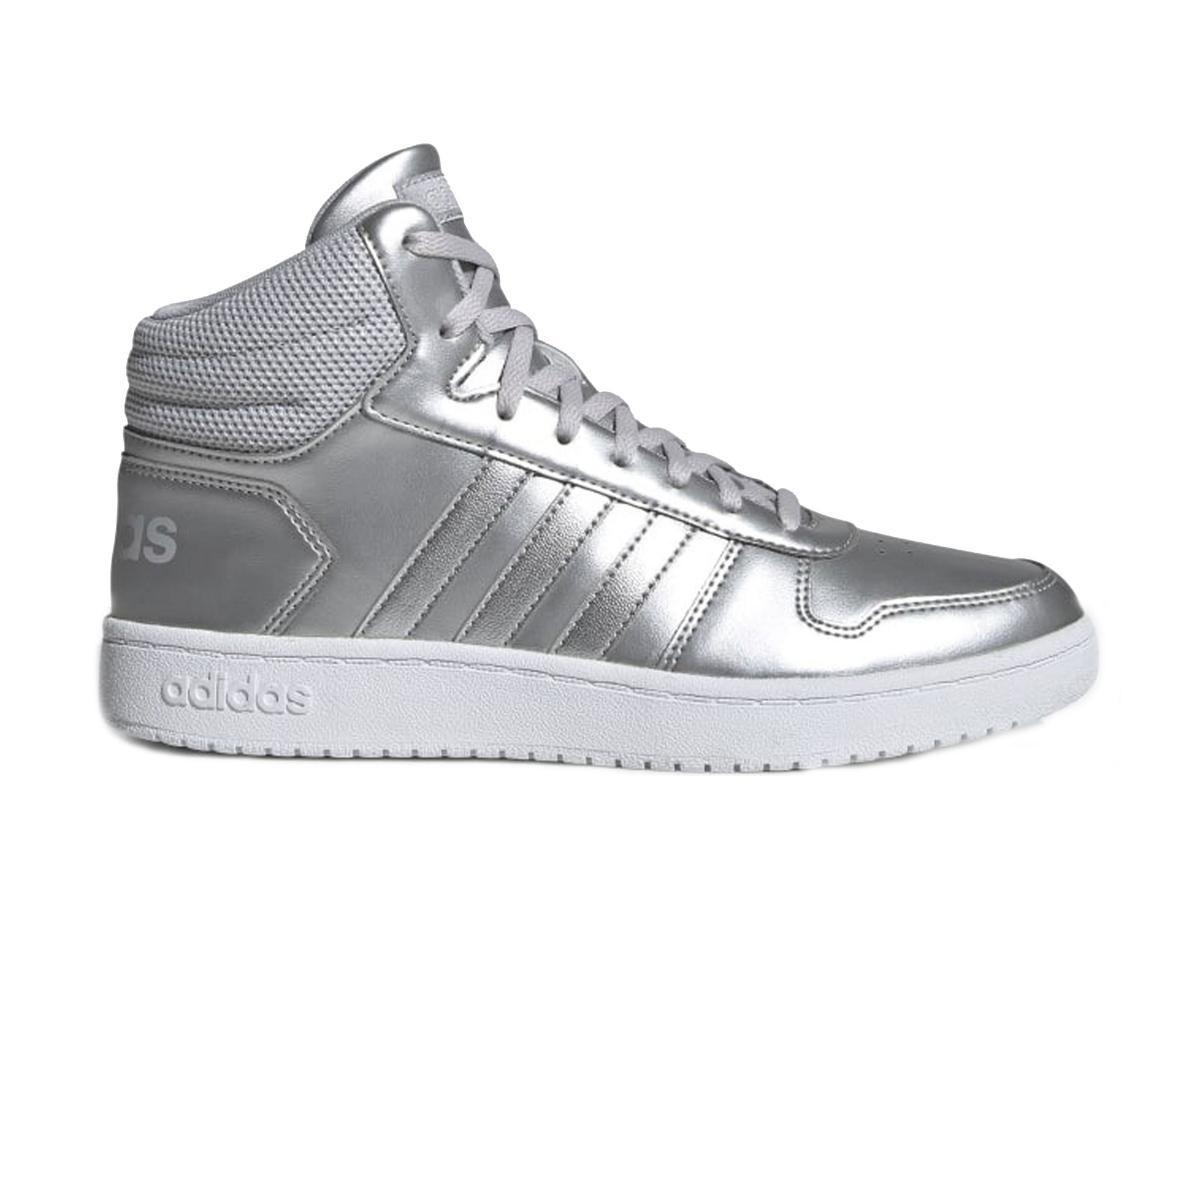 adidas donna scarpe snikers